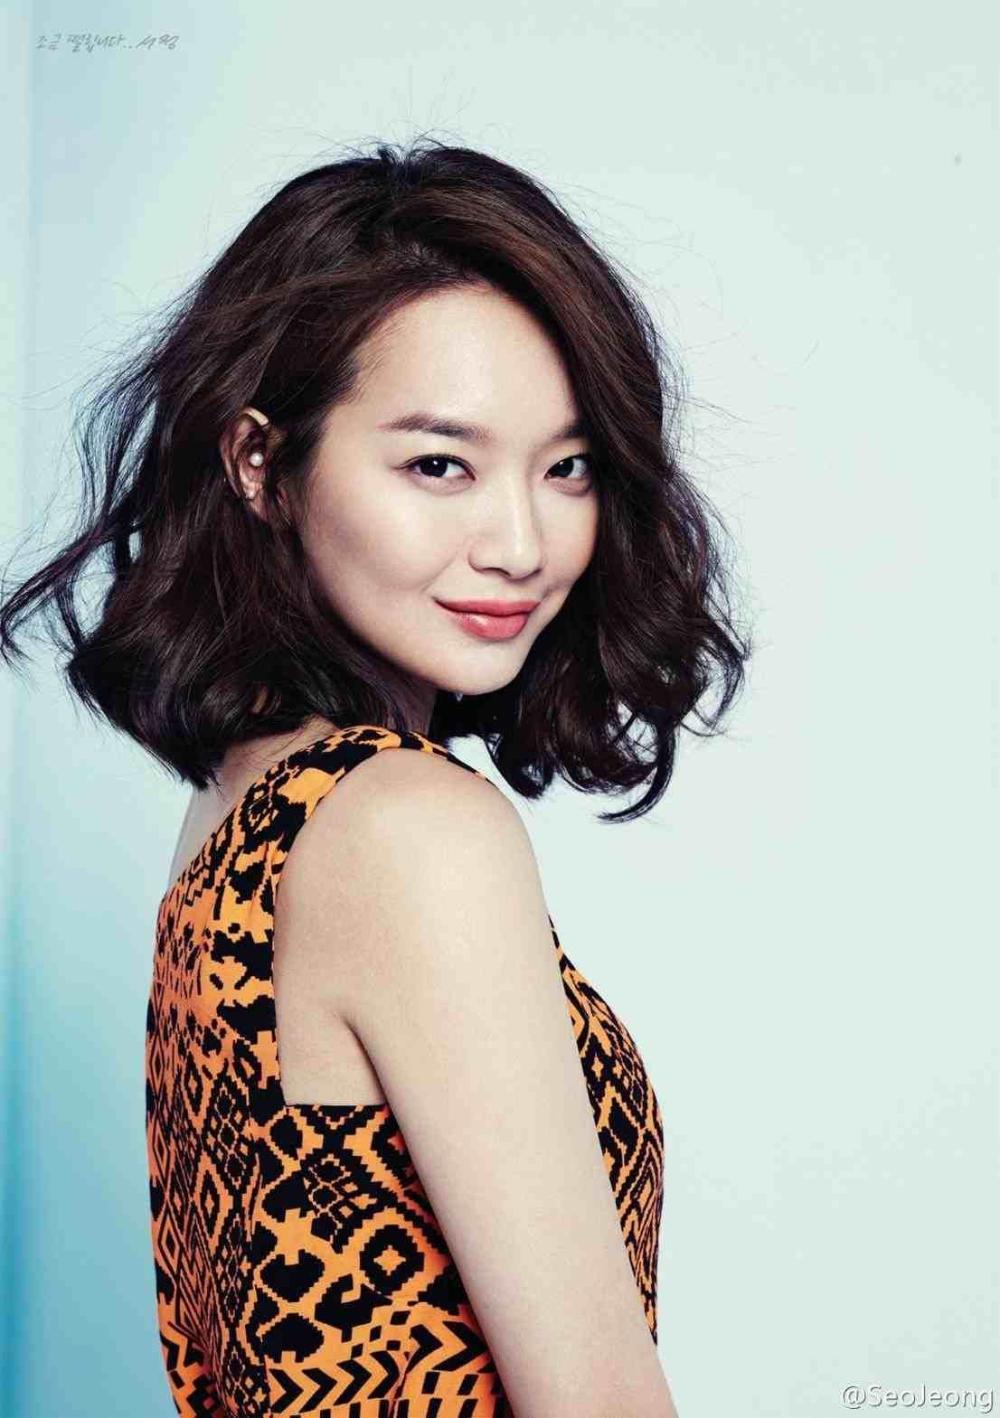 30 Best Short Curly Hairstyles Korean Image In 2020 Medium Hair Styles Korean Hairstyle Short Hair Styles